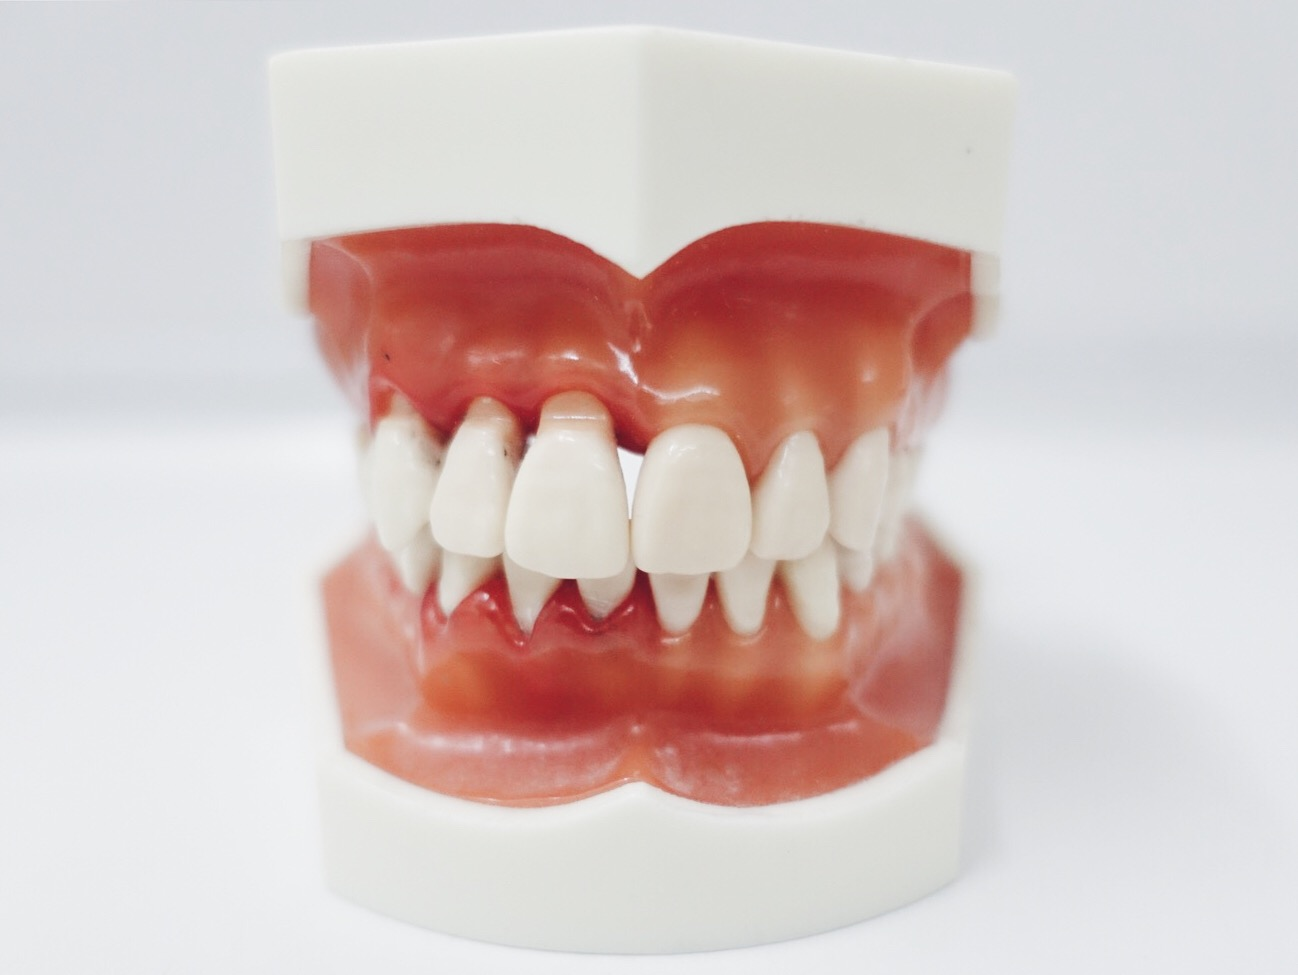 restauraties, tandarts coene, tandarts den haag, one-day-dentistry